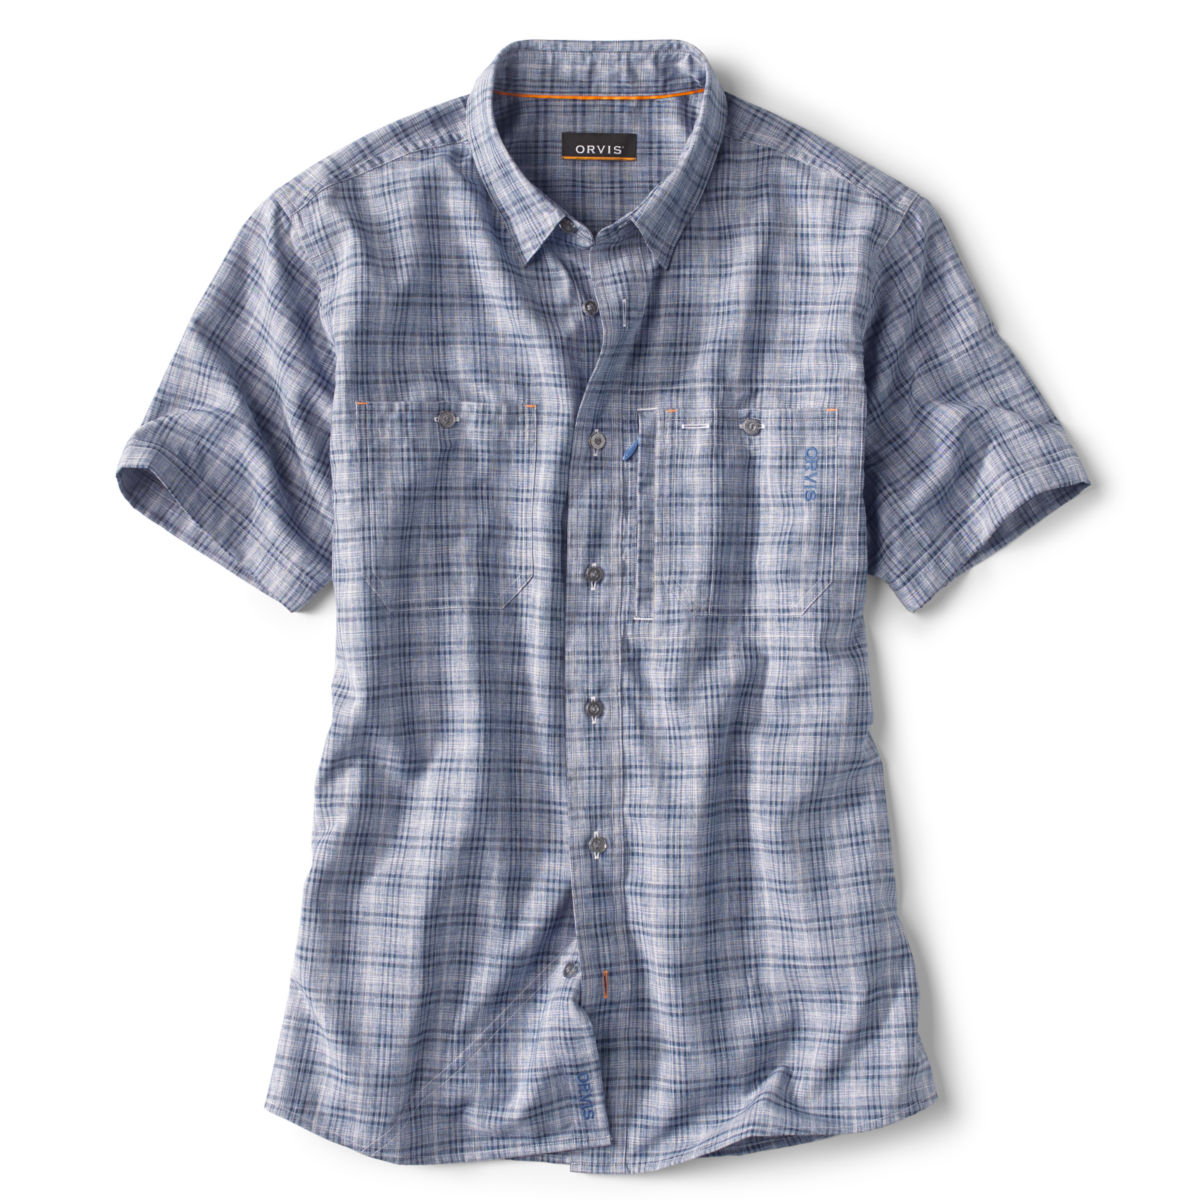 Bowman Short-Sleeved Work Shirt - image number 0